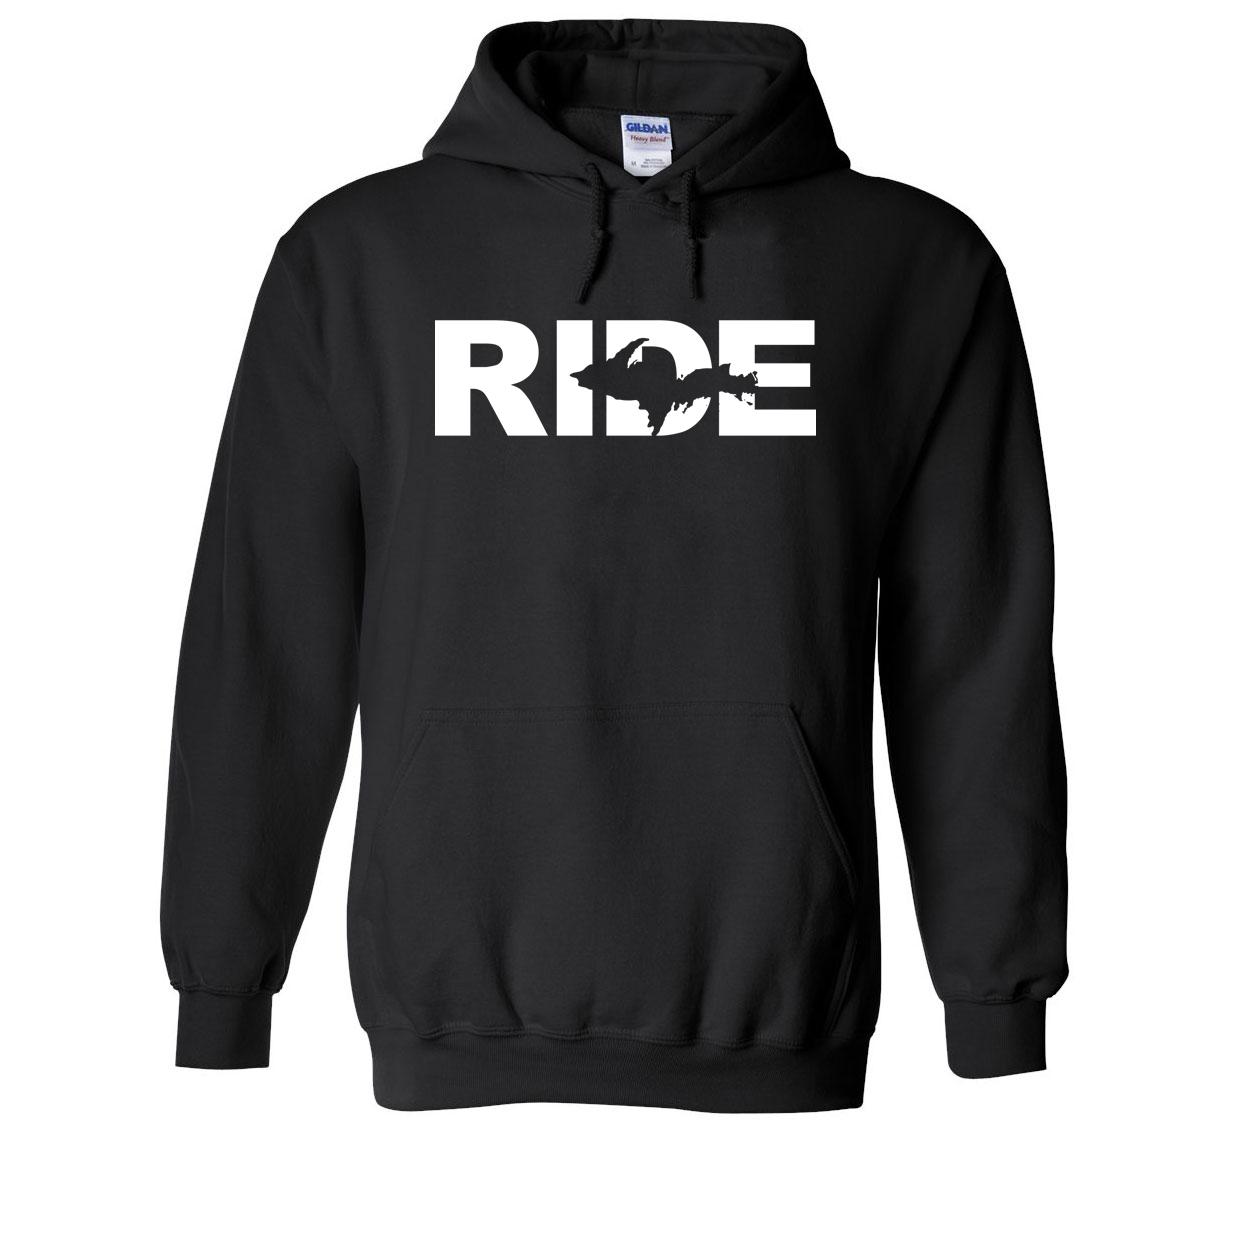 Ride Michigan UP Classic Sweatshirt Black (White Logo)